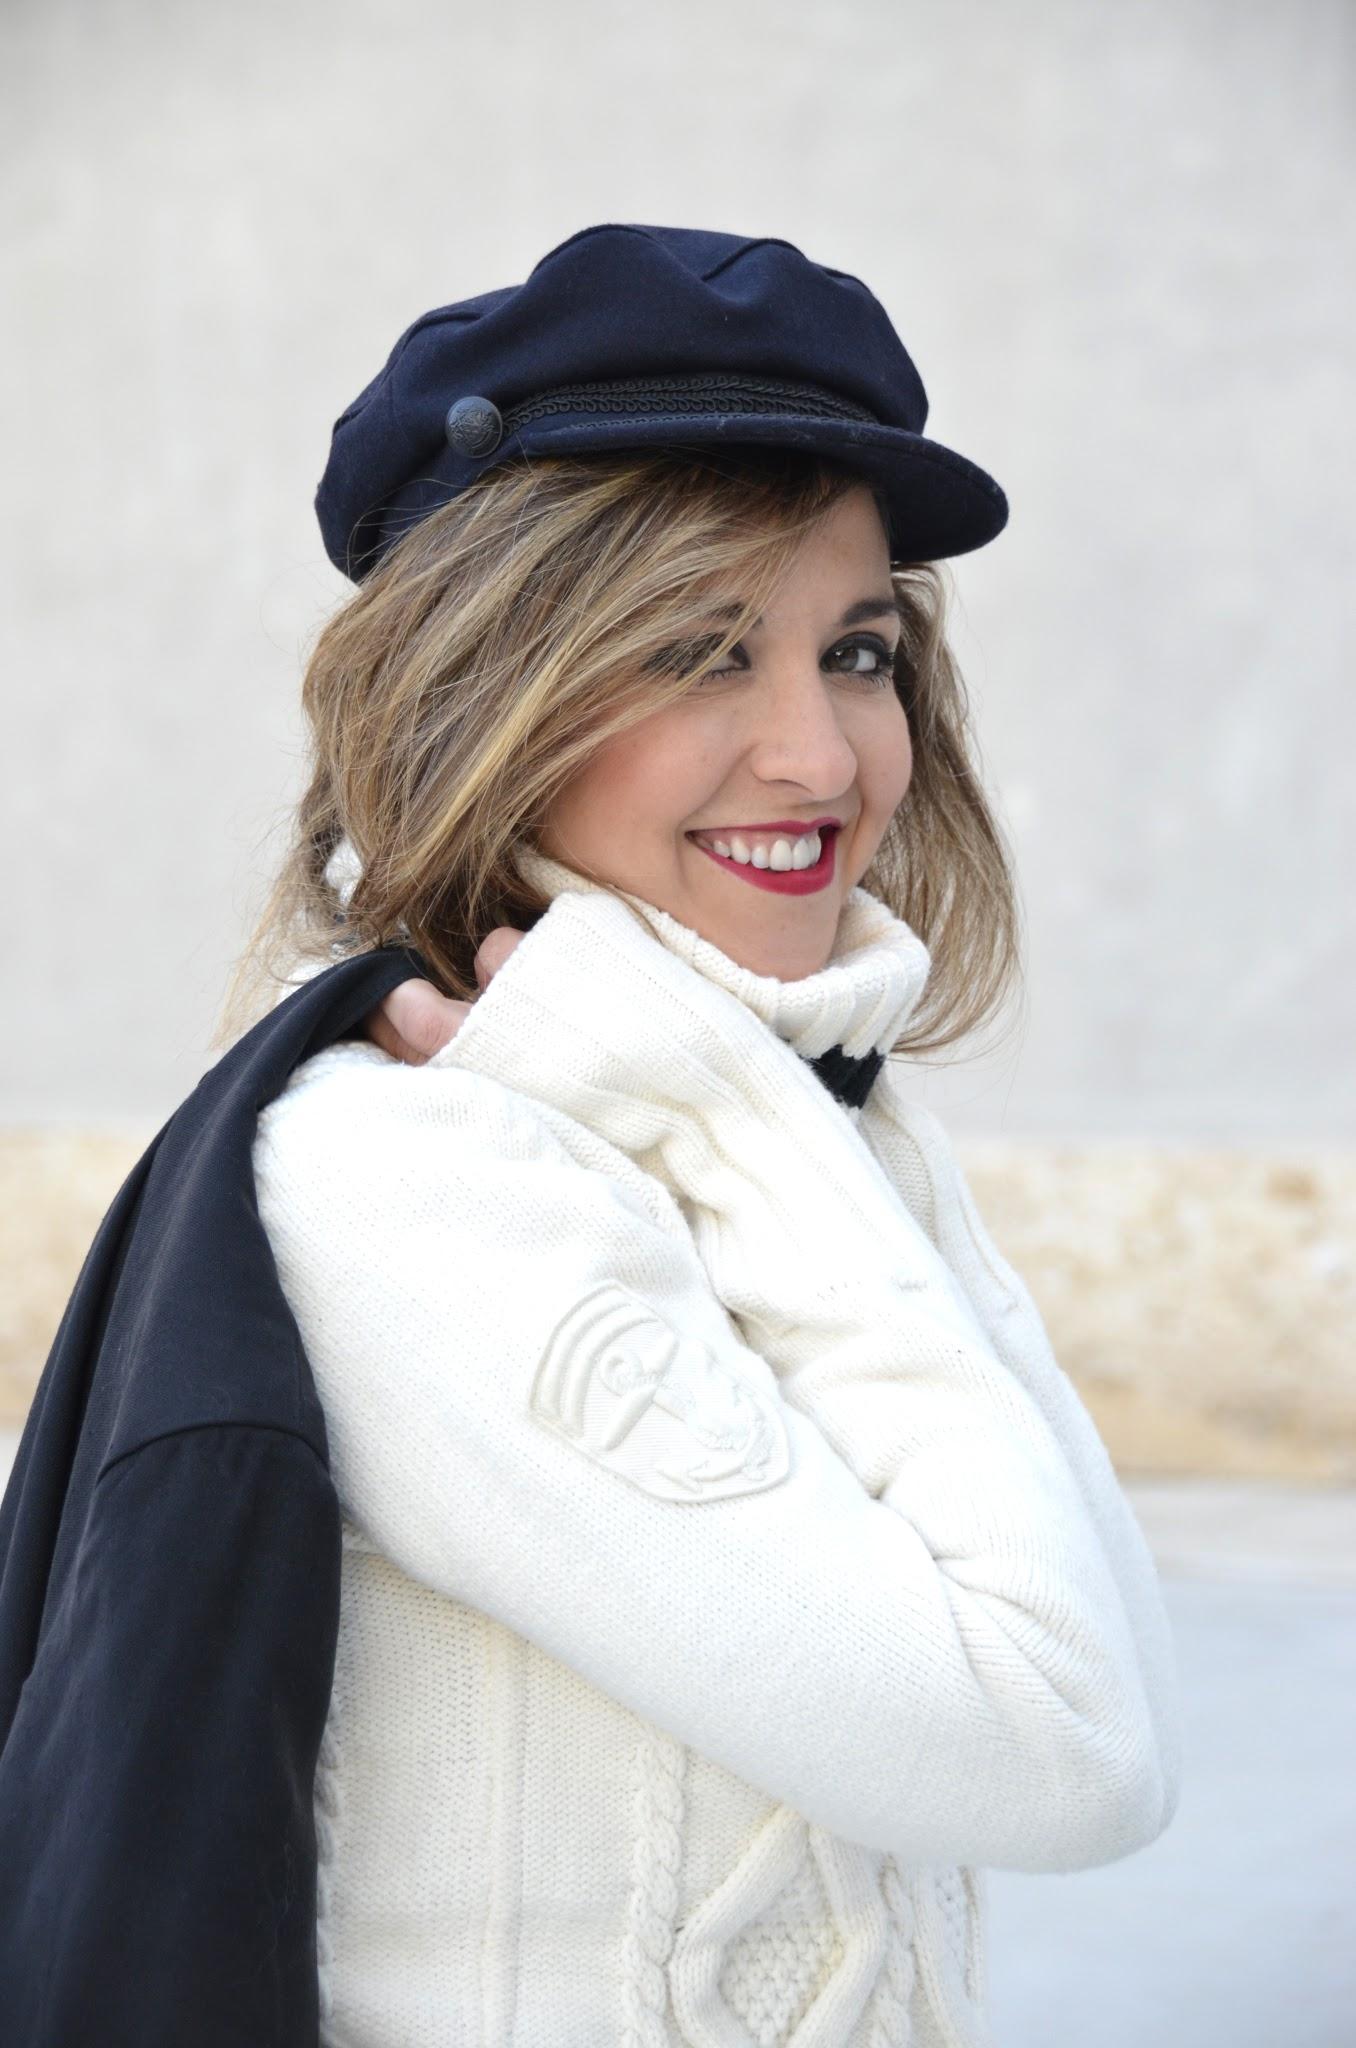 gorra marinera fall winter 2016 blogger tarasessence